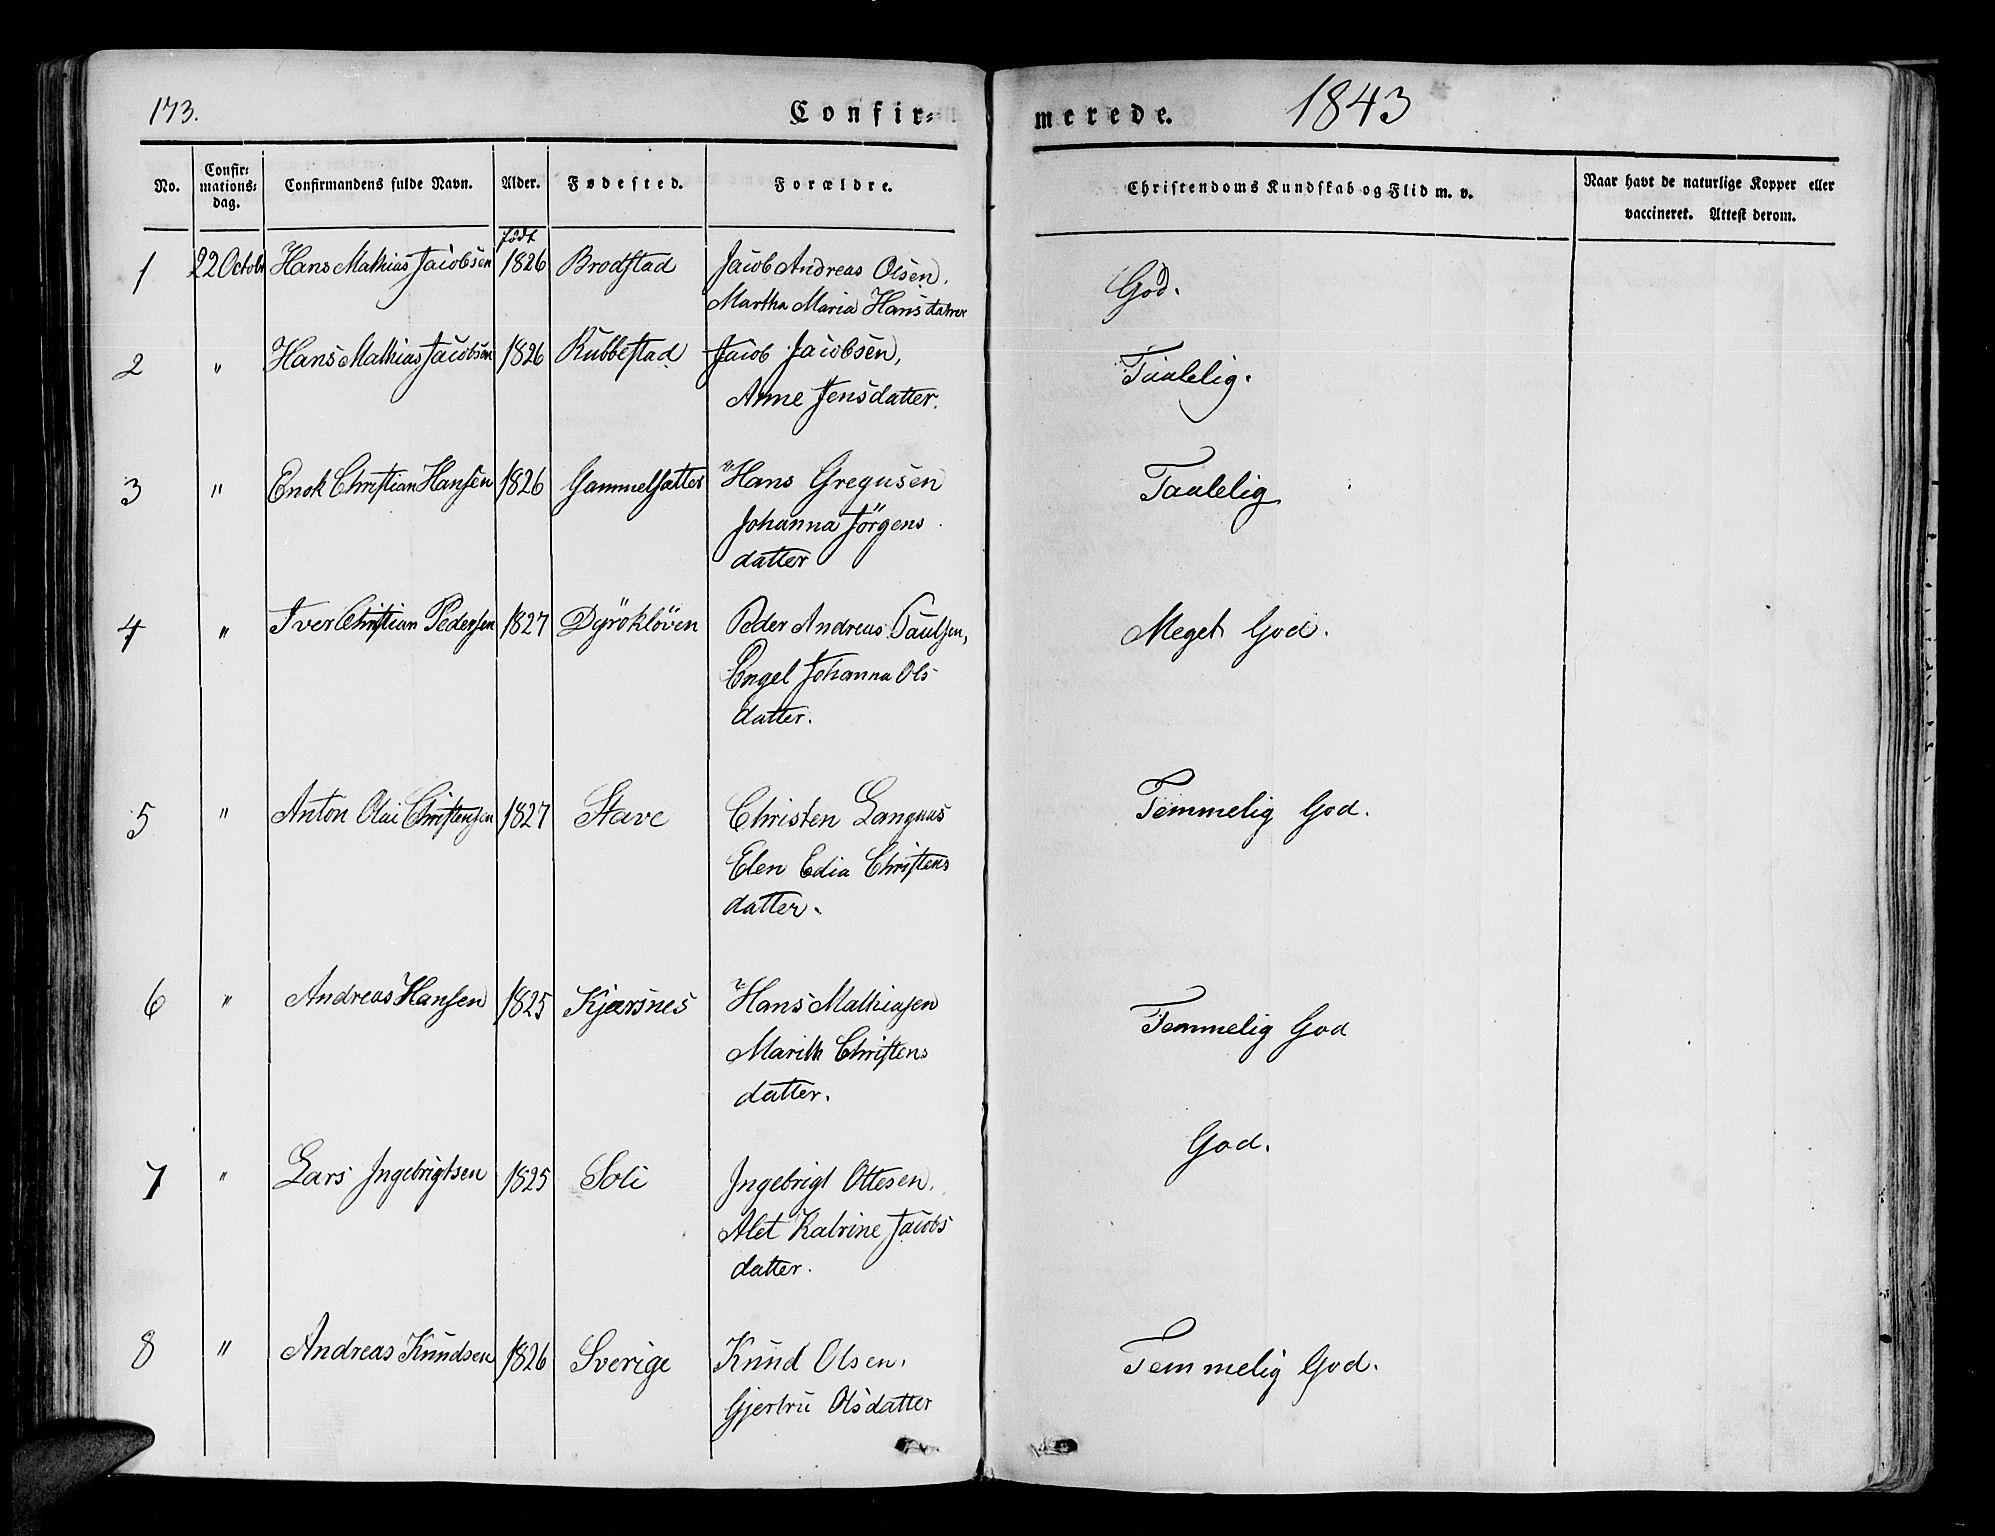 SATØ, Tranøy sokneprestkontor, I/Ia/Iaa/L0005kirke: Ministerialbok nr. 5, 1829-1844, s. 173